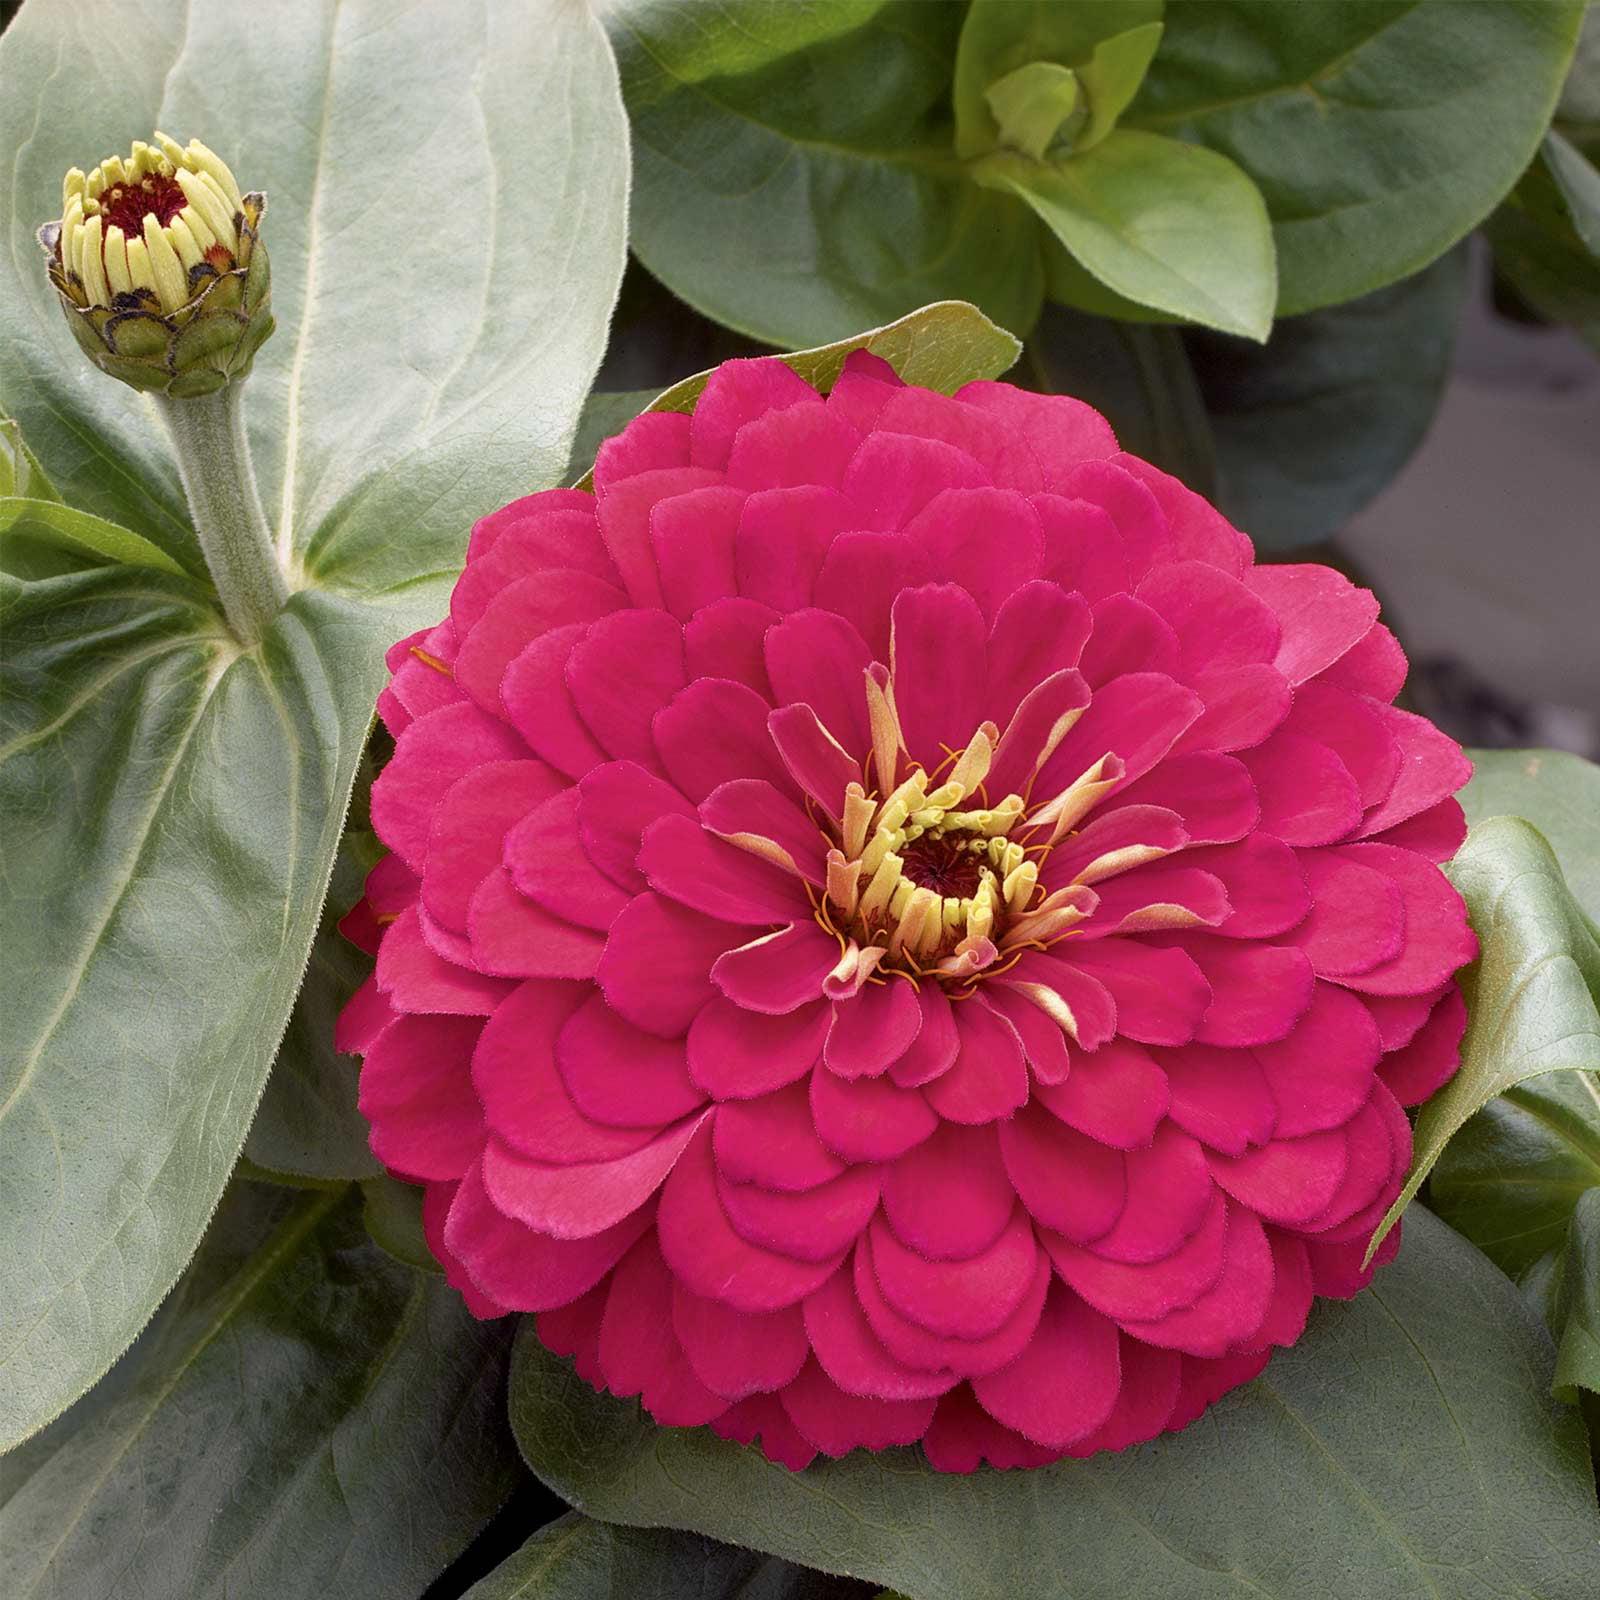 Zinnia Flower Garden Seeds - Magellan Series - Cherry - 100 Seeds - Annual Flower Gardening Seed